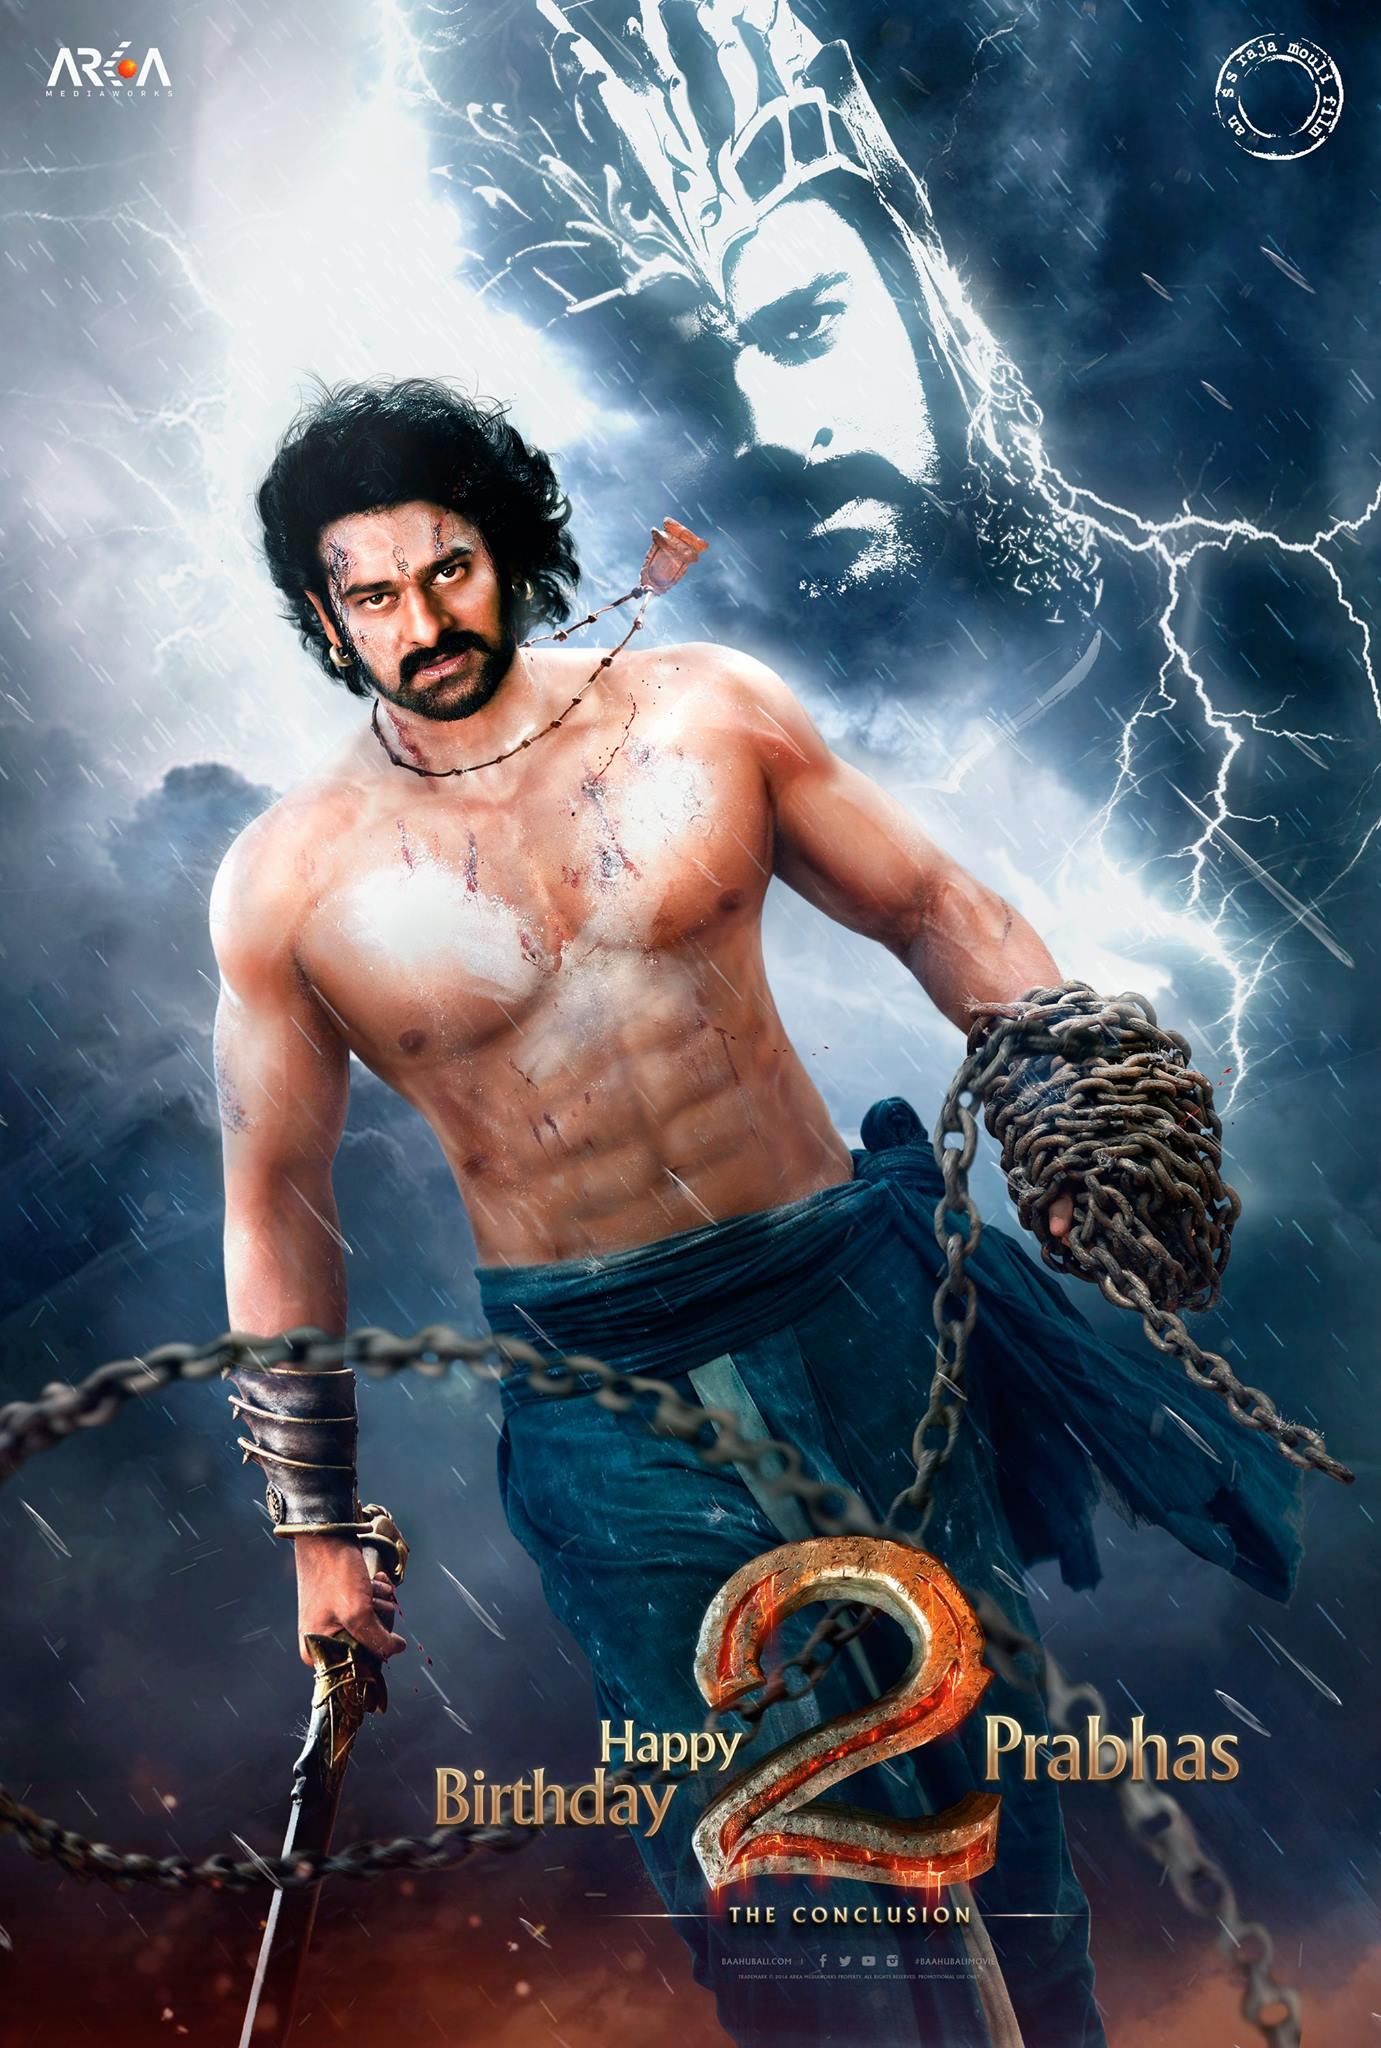 Prabhas Baahubali Movie Wallpapers Ultra HD | 25CineFrames